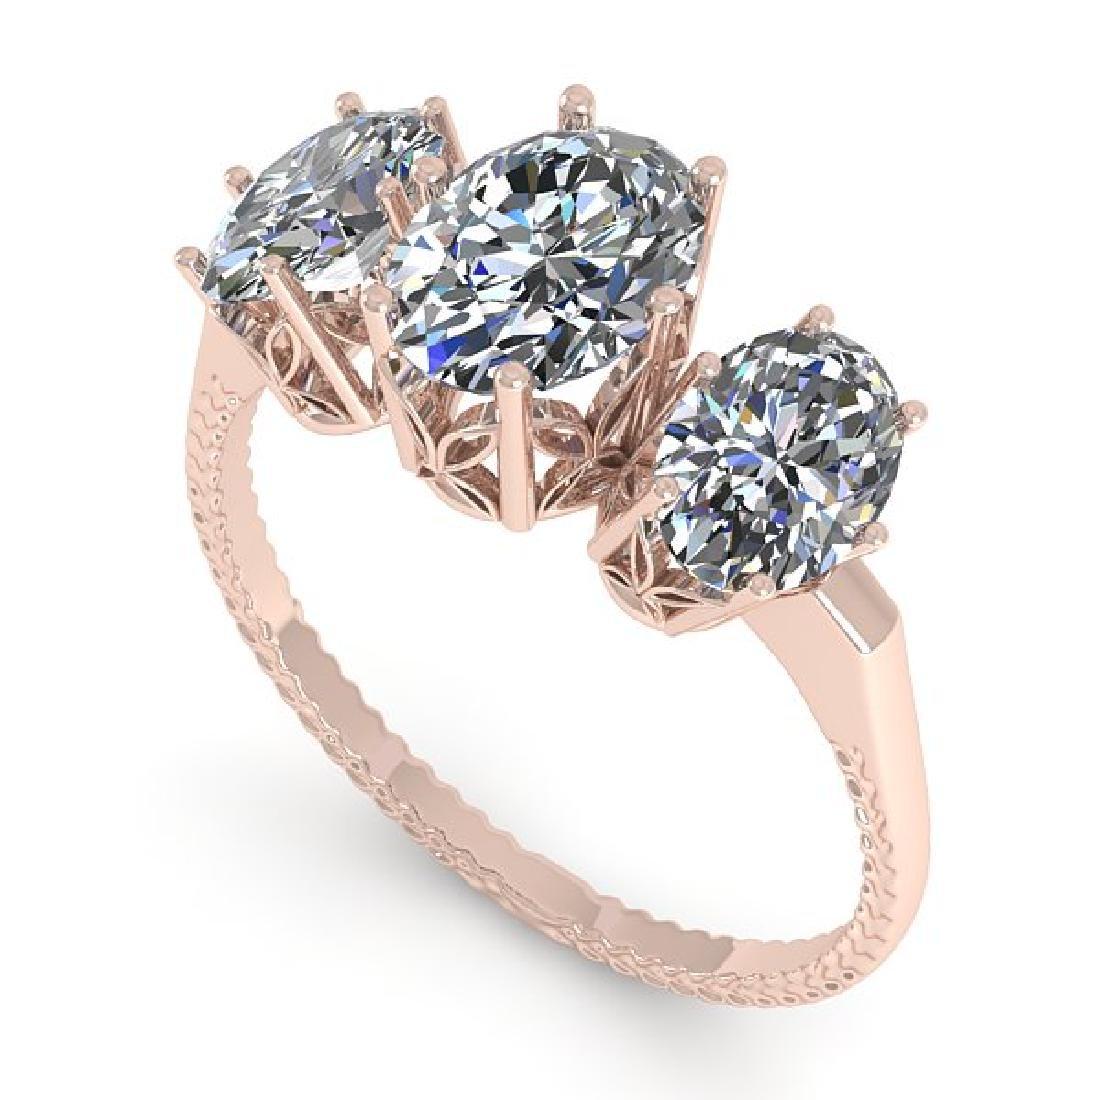 2.0 CTW VS/SI Oval Diamond Art Deco Ring 14K Rose Gold - 2